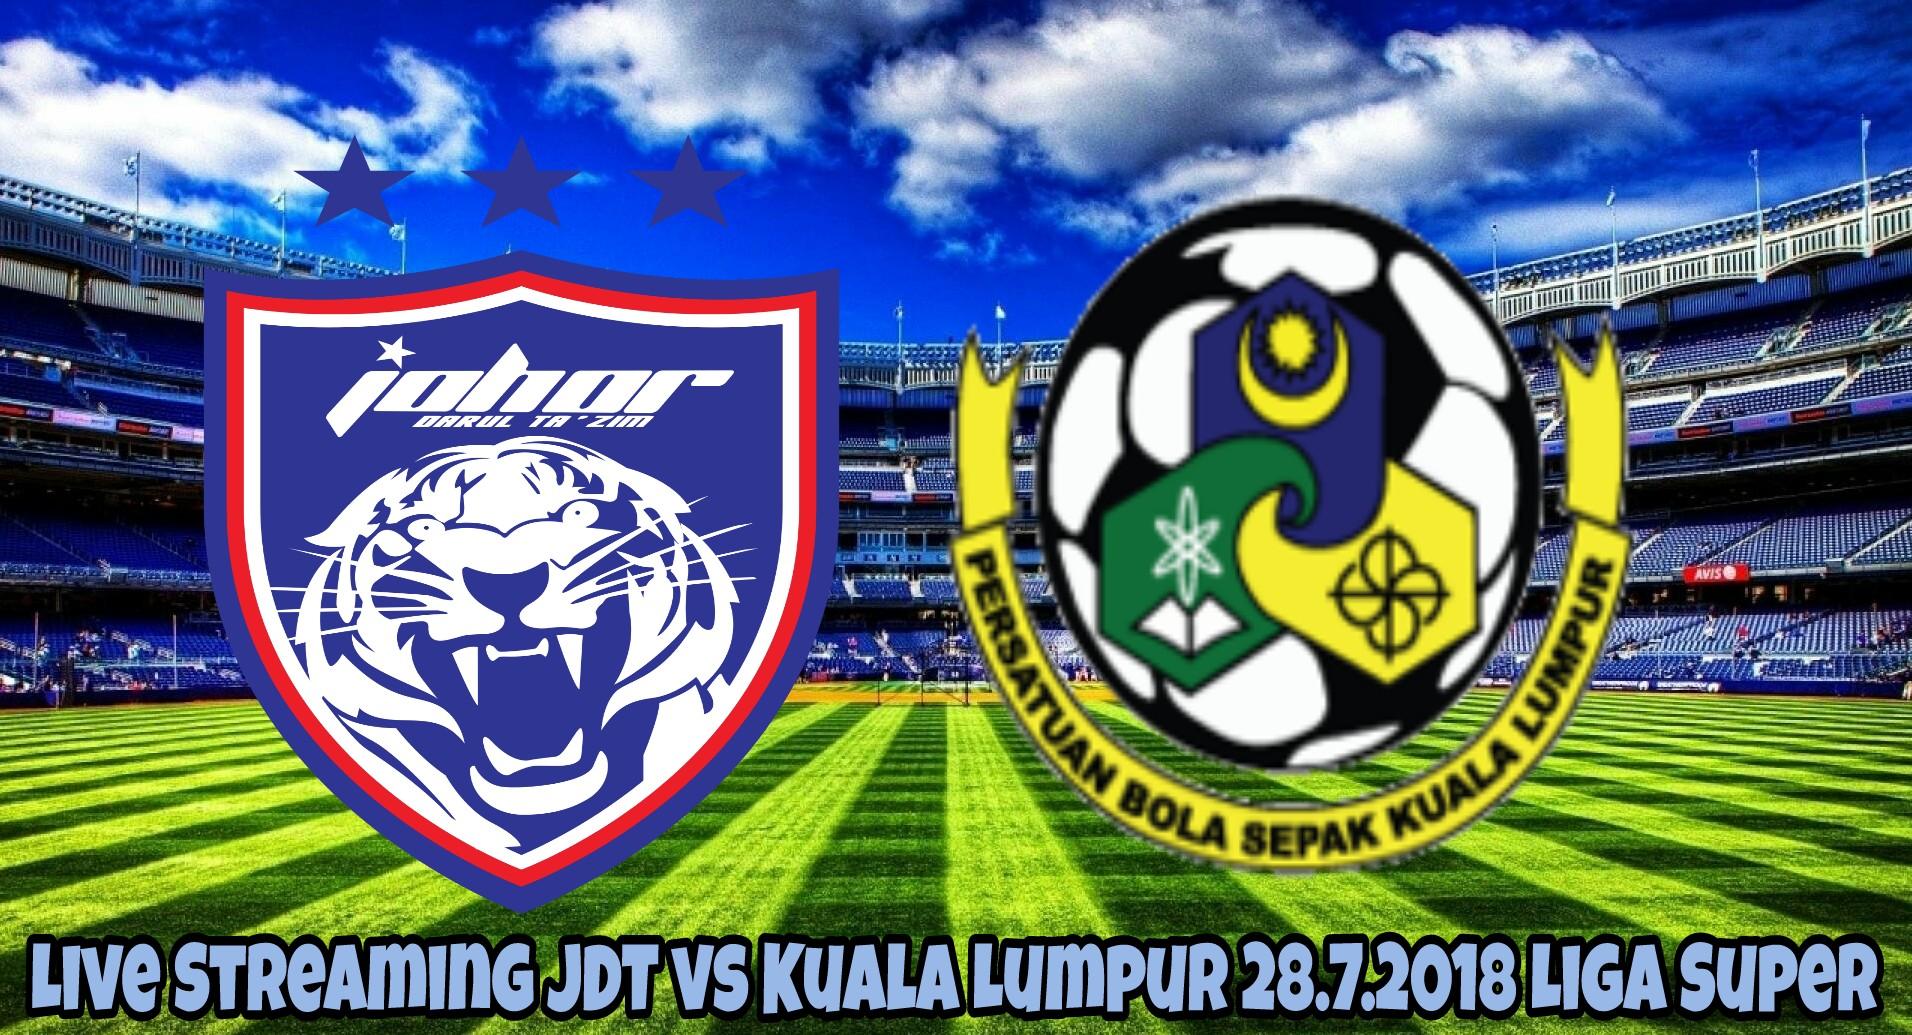 Live Streaming JDT vs Kuala Lumpur 28.7.2018 Liga Super